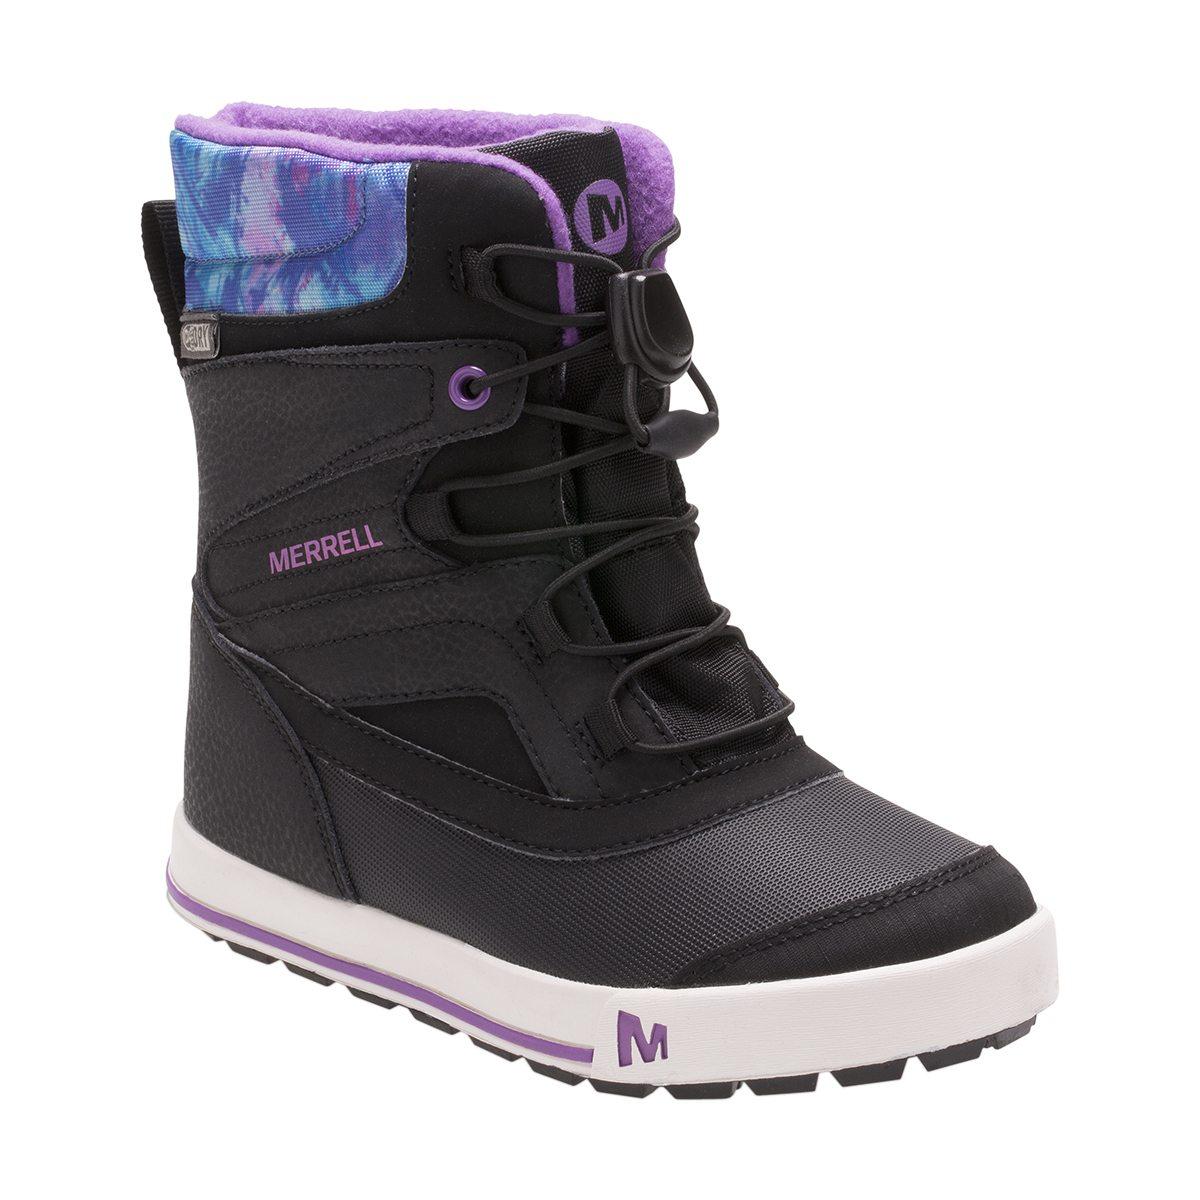 more photos 2bb2f 8e14a violet merrell snow bank 2.0 waterproof vinterkänga barn vinterskor